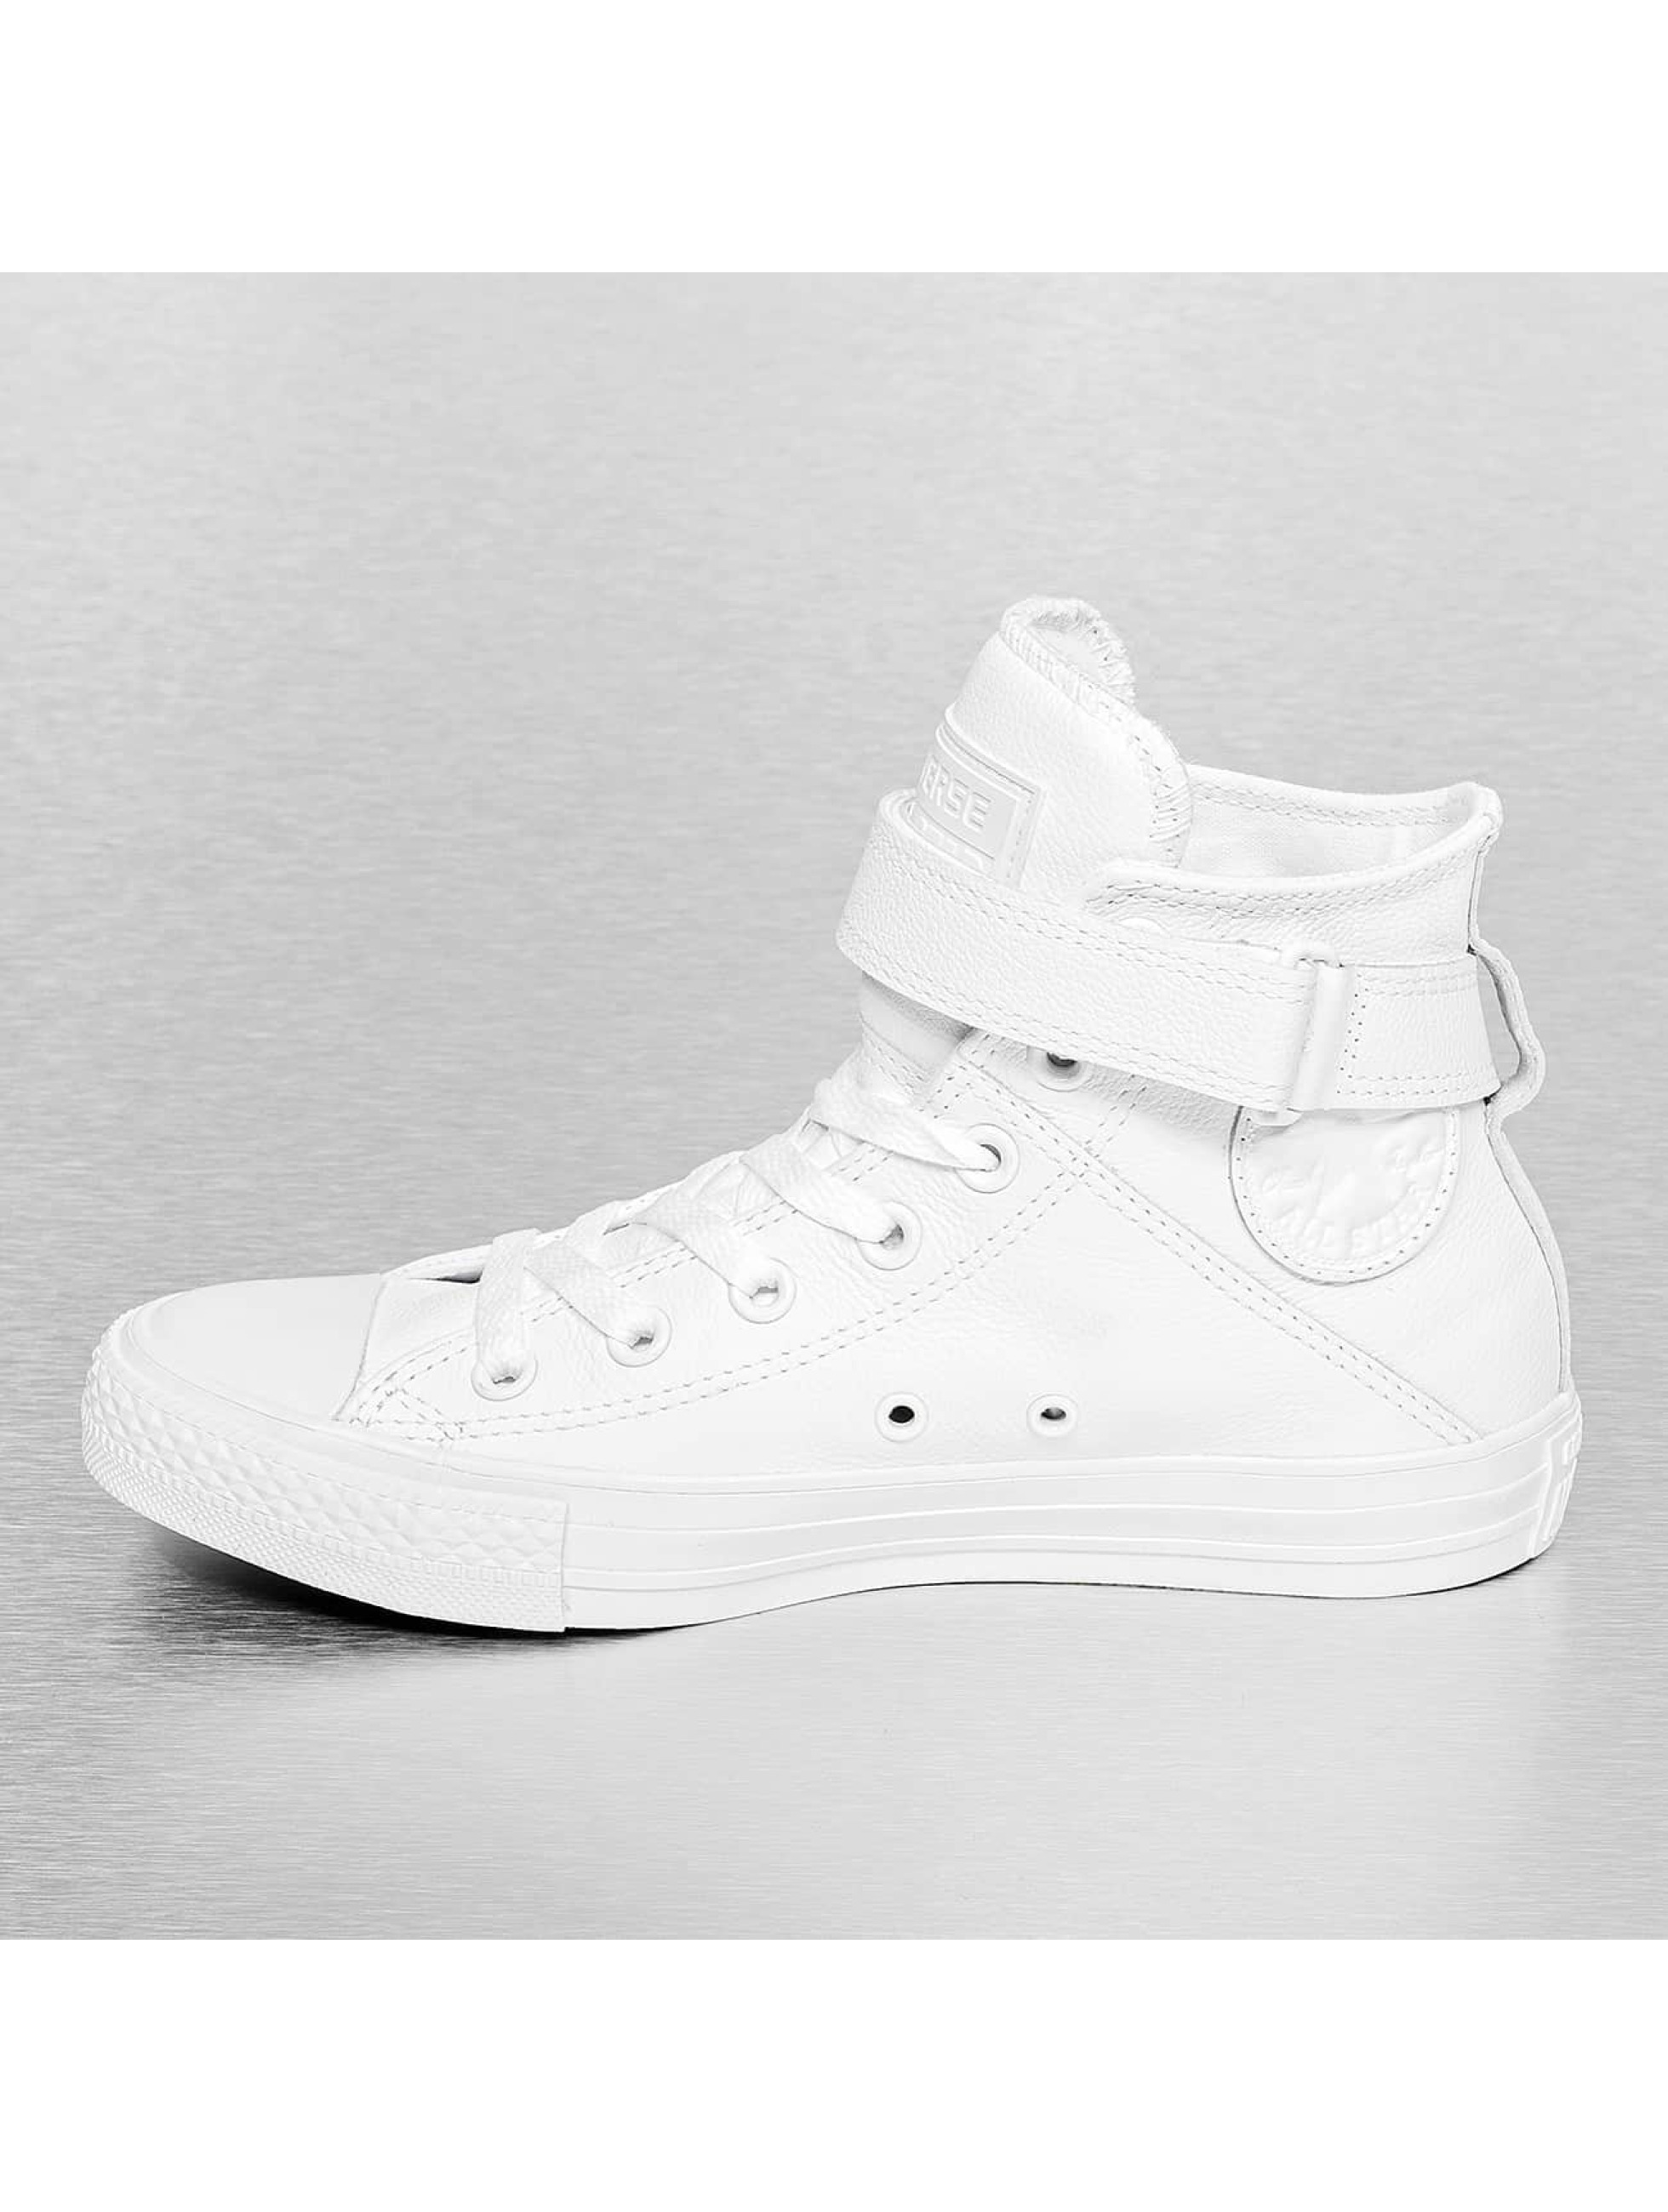 sneaker converse leder wei akileos. Black Bedroom Furniture Sets. Home Design Ideas